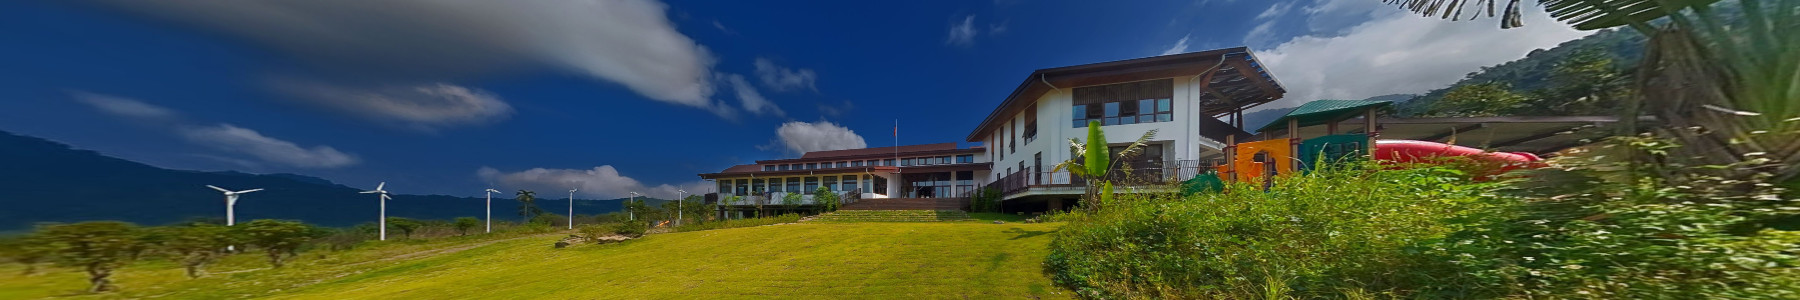 Ming Chuang Elementary School